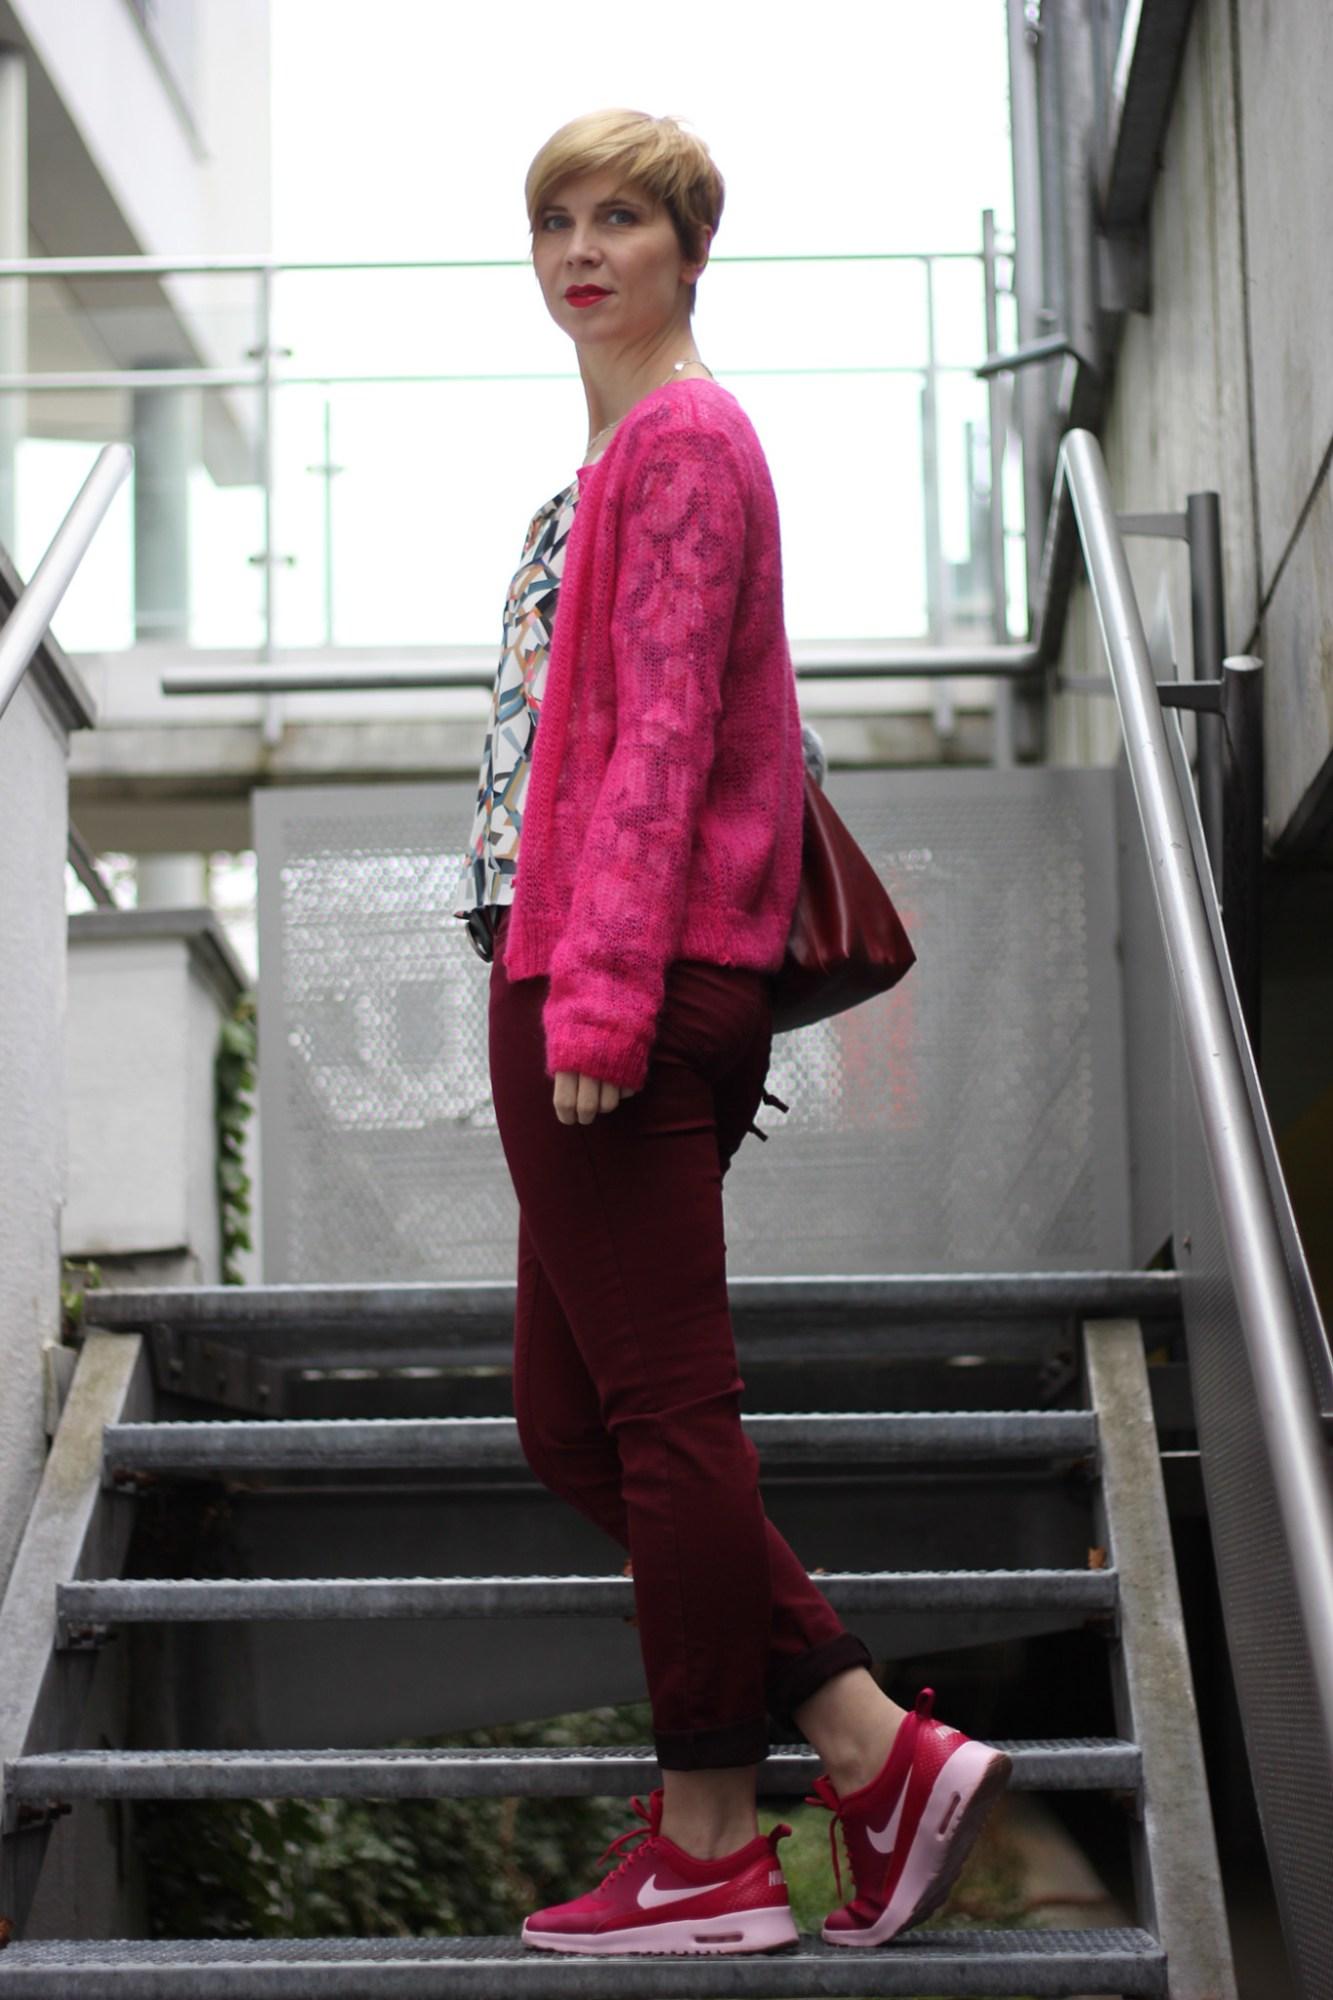 IMG_8169-pink-red-connydolllifestyle-bloggerprojekt-ann-fab40s